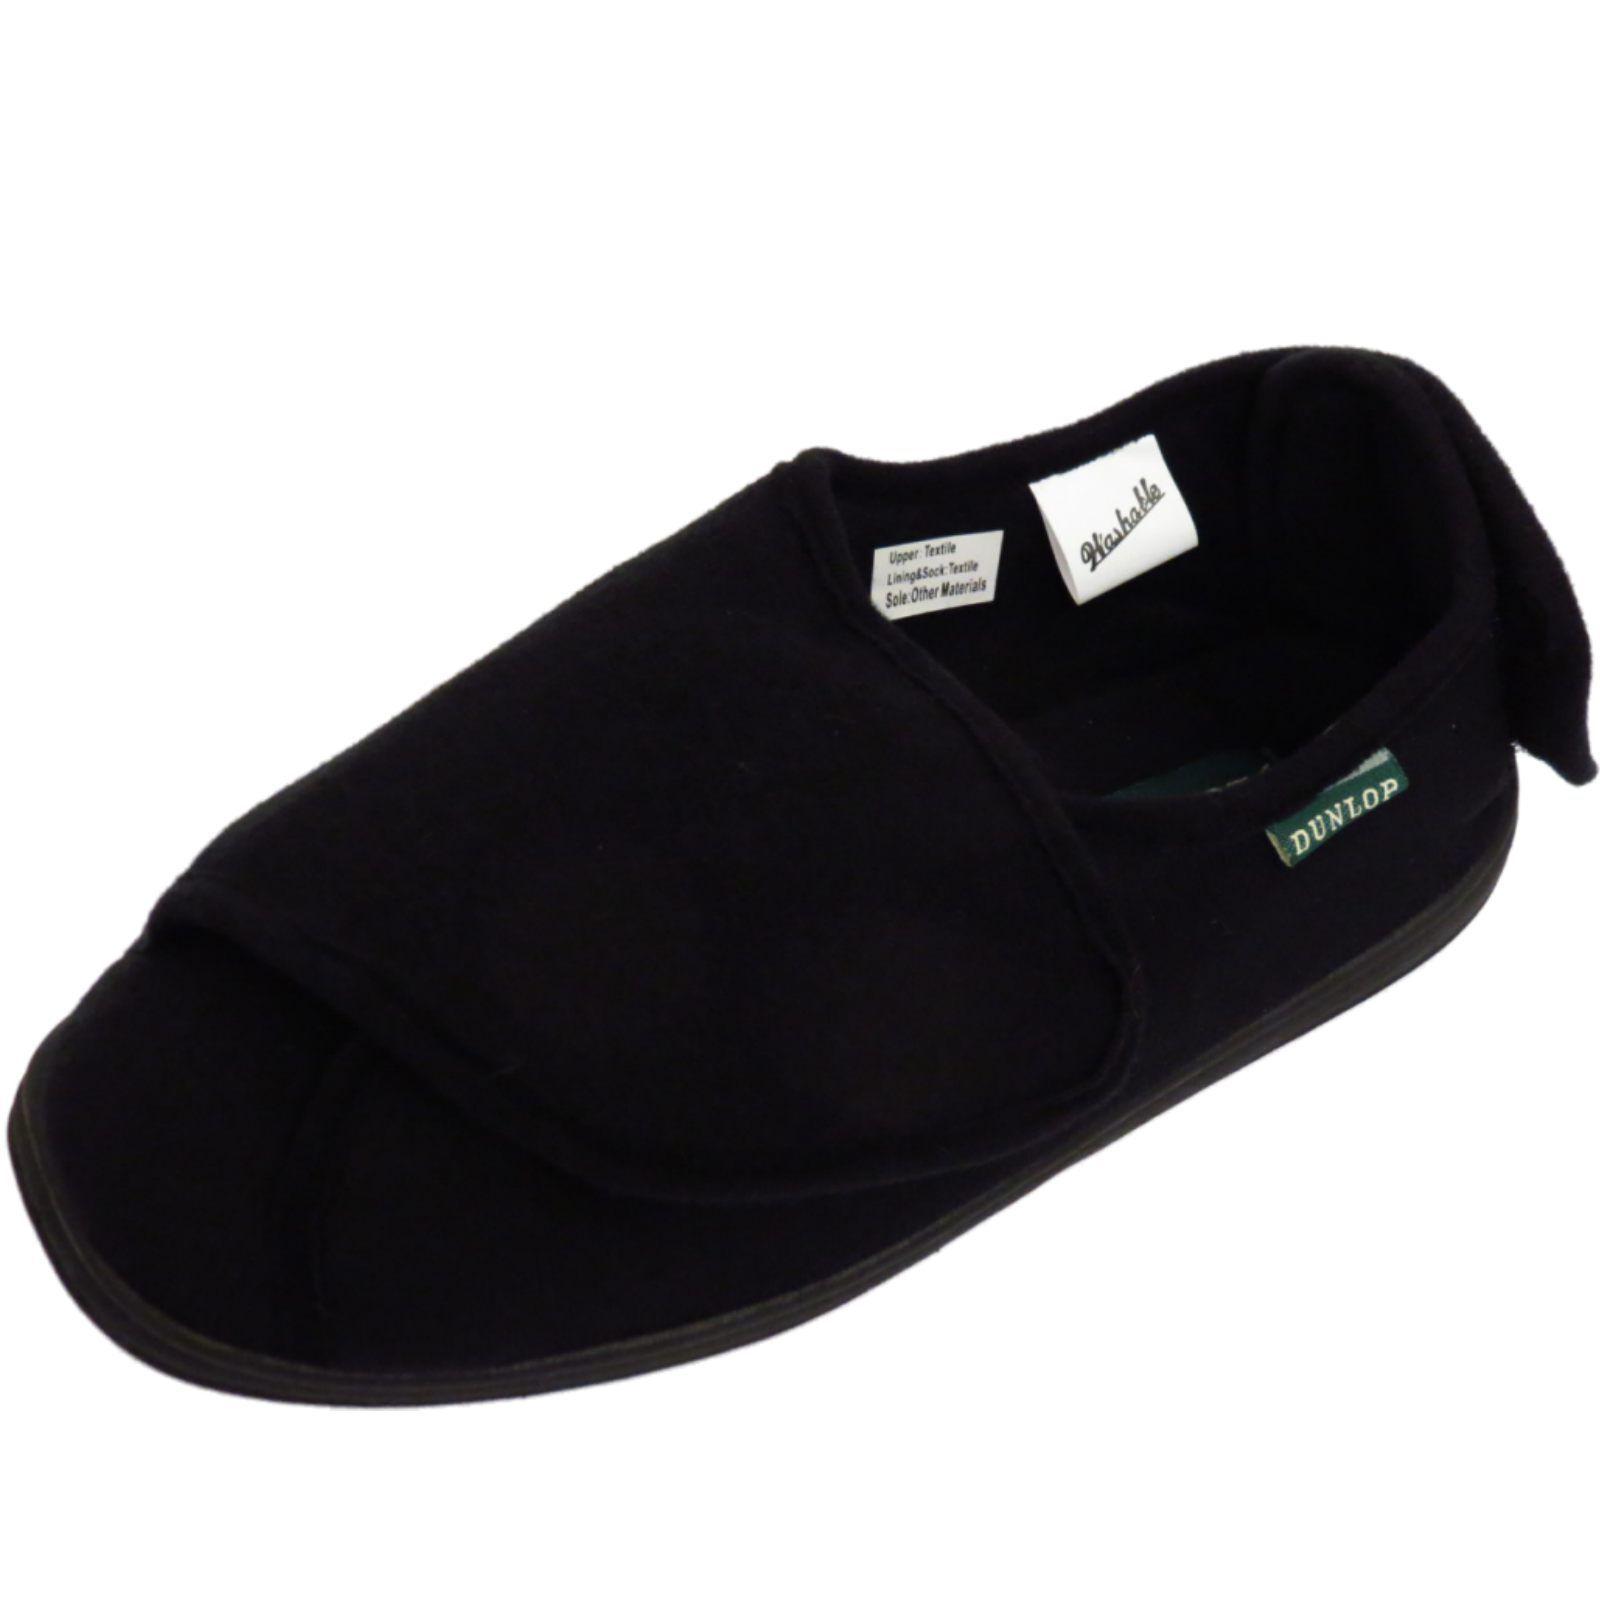 Comfort Negro Wide Hombre Indoor Dunlop Orthopaedic Fit wPBfnRAtq